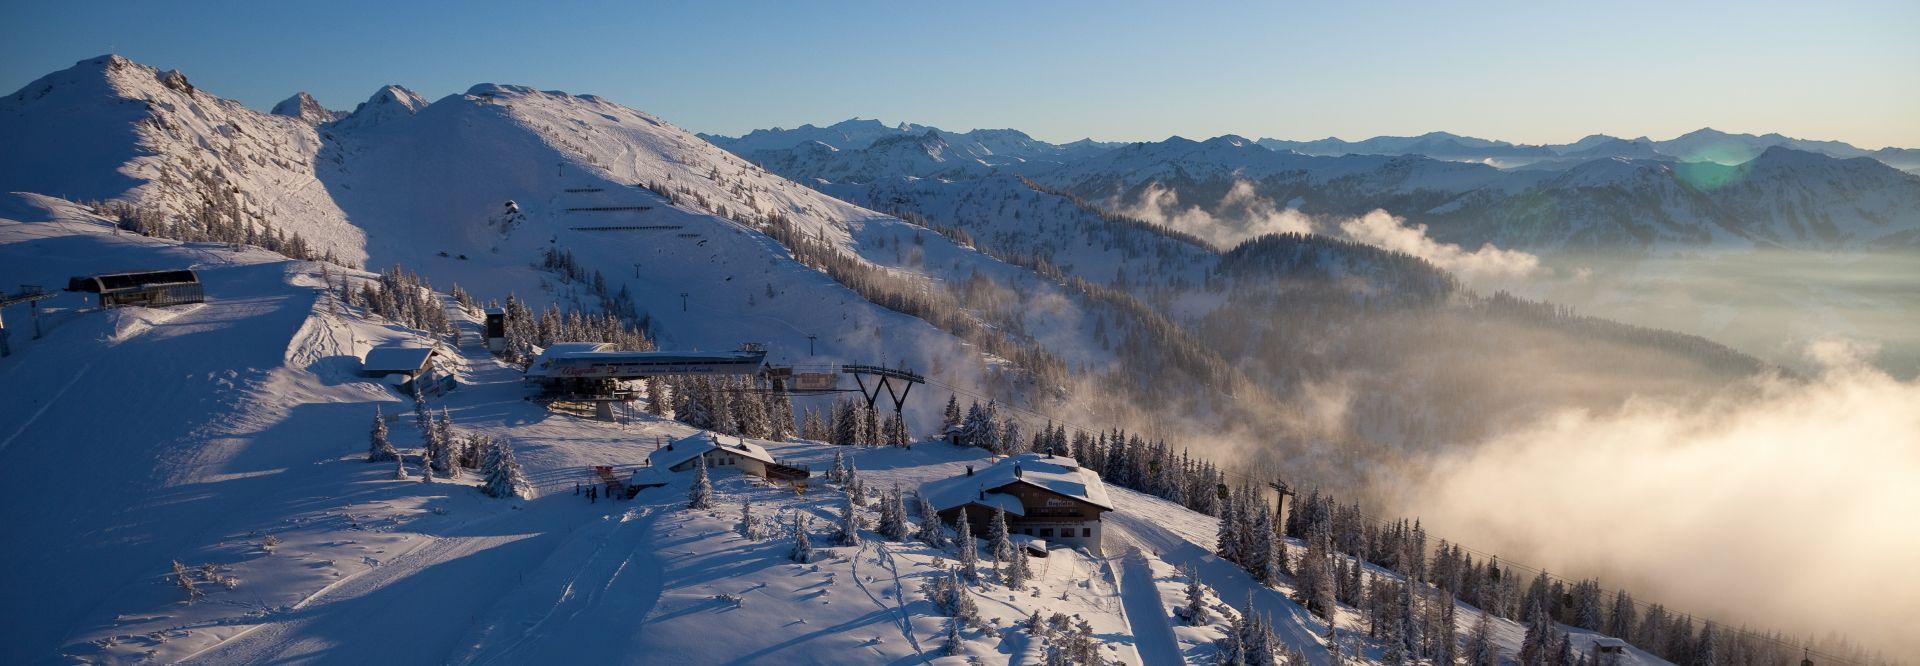 Bergstation Flying Mozart (c) TVB WagrainKleinarl (Chaletdorf Prechtlgut)